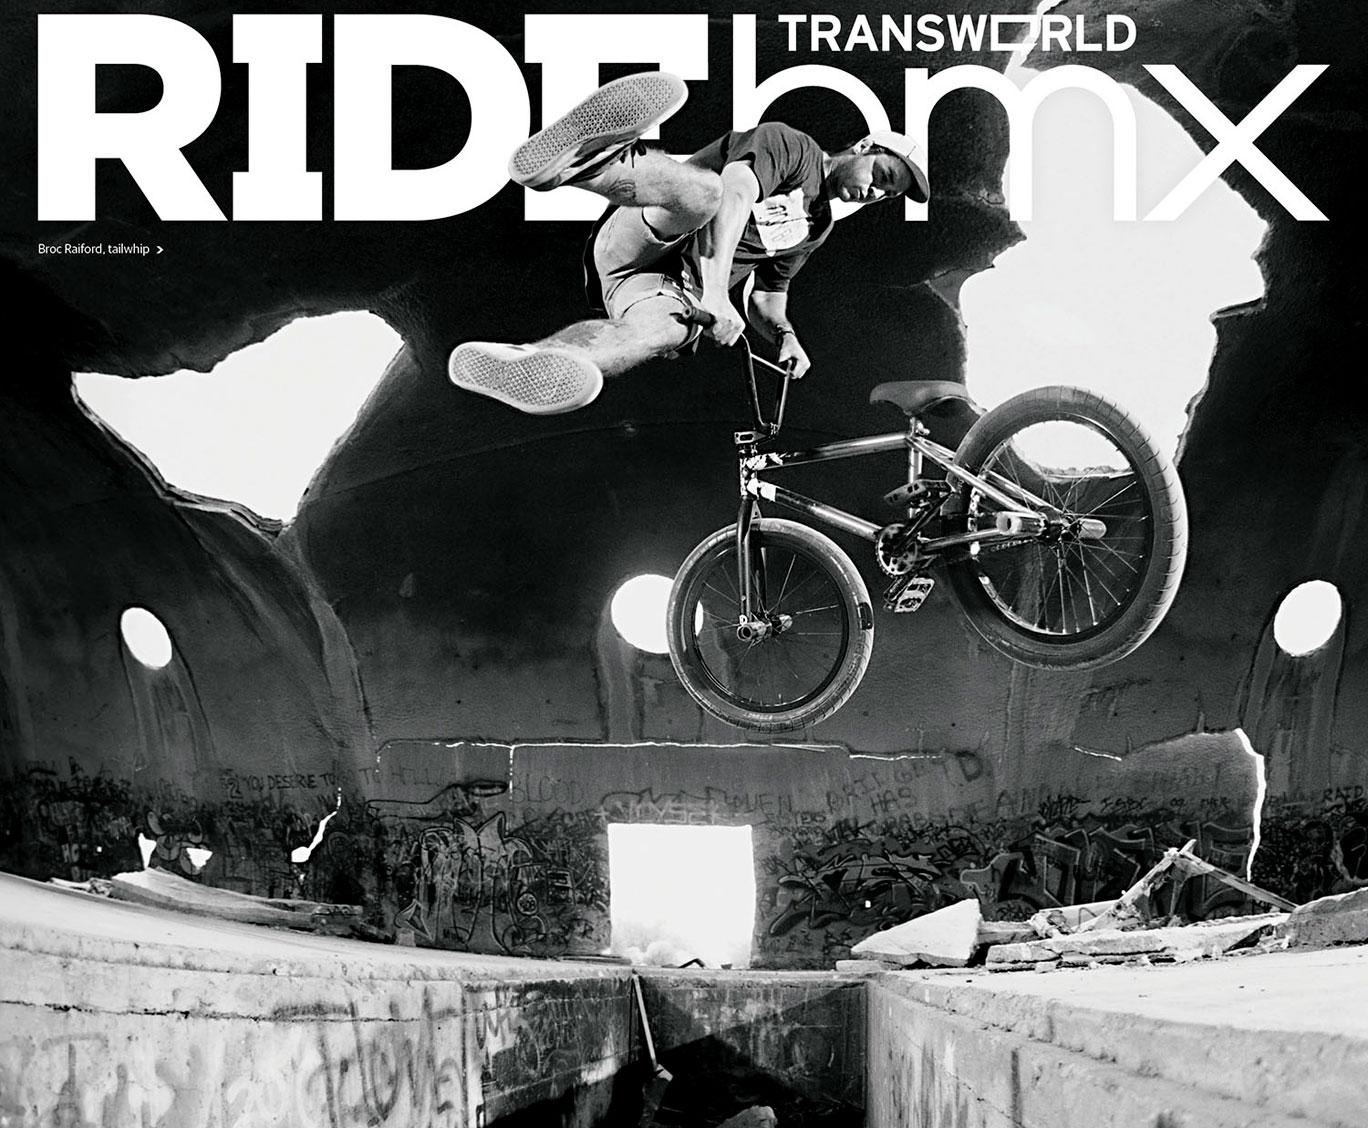 brocs-ride-cover